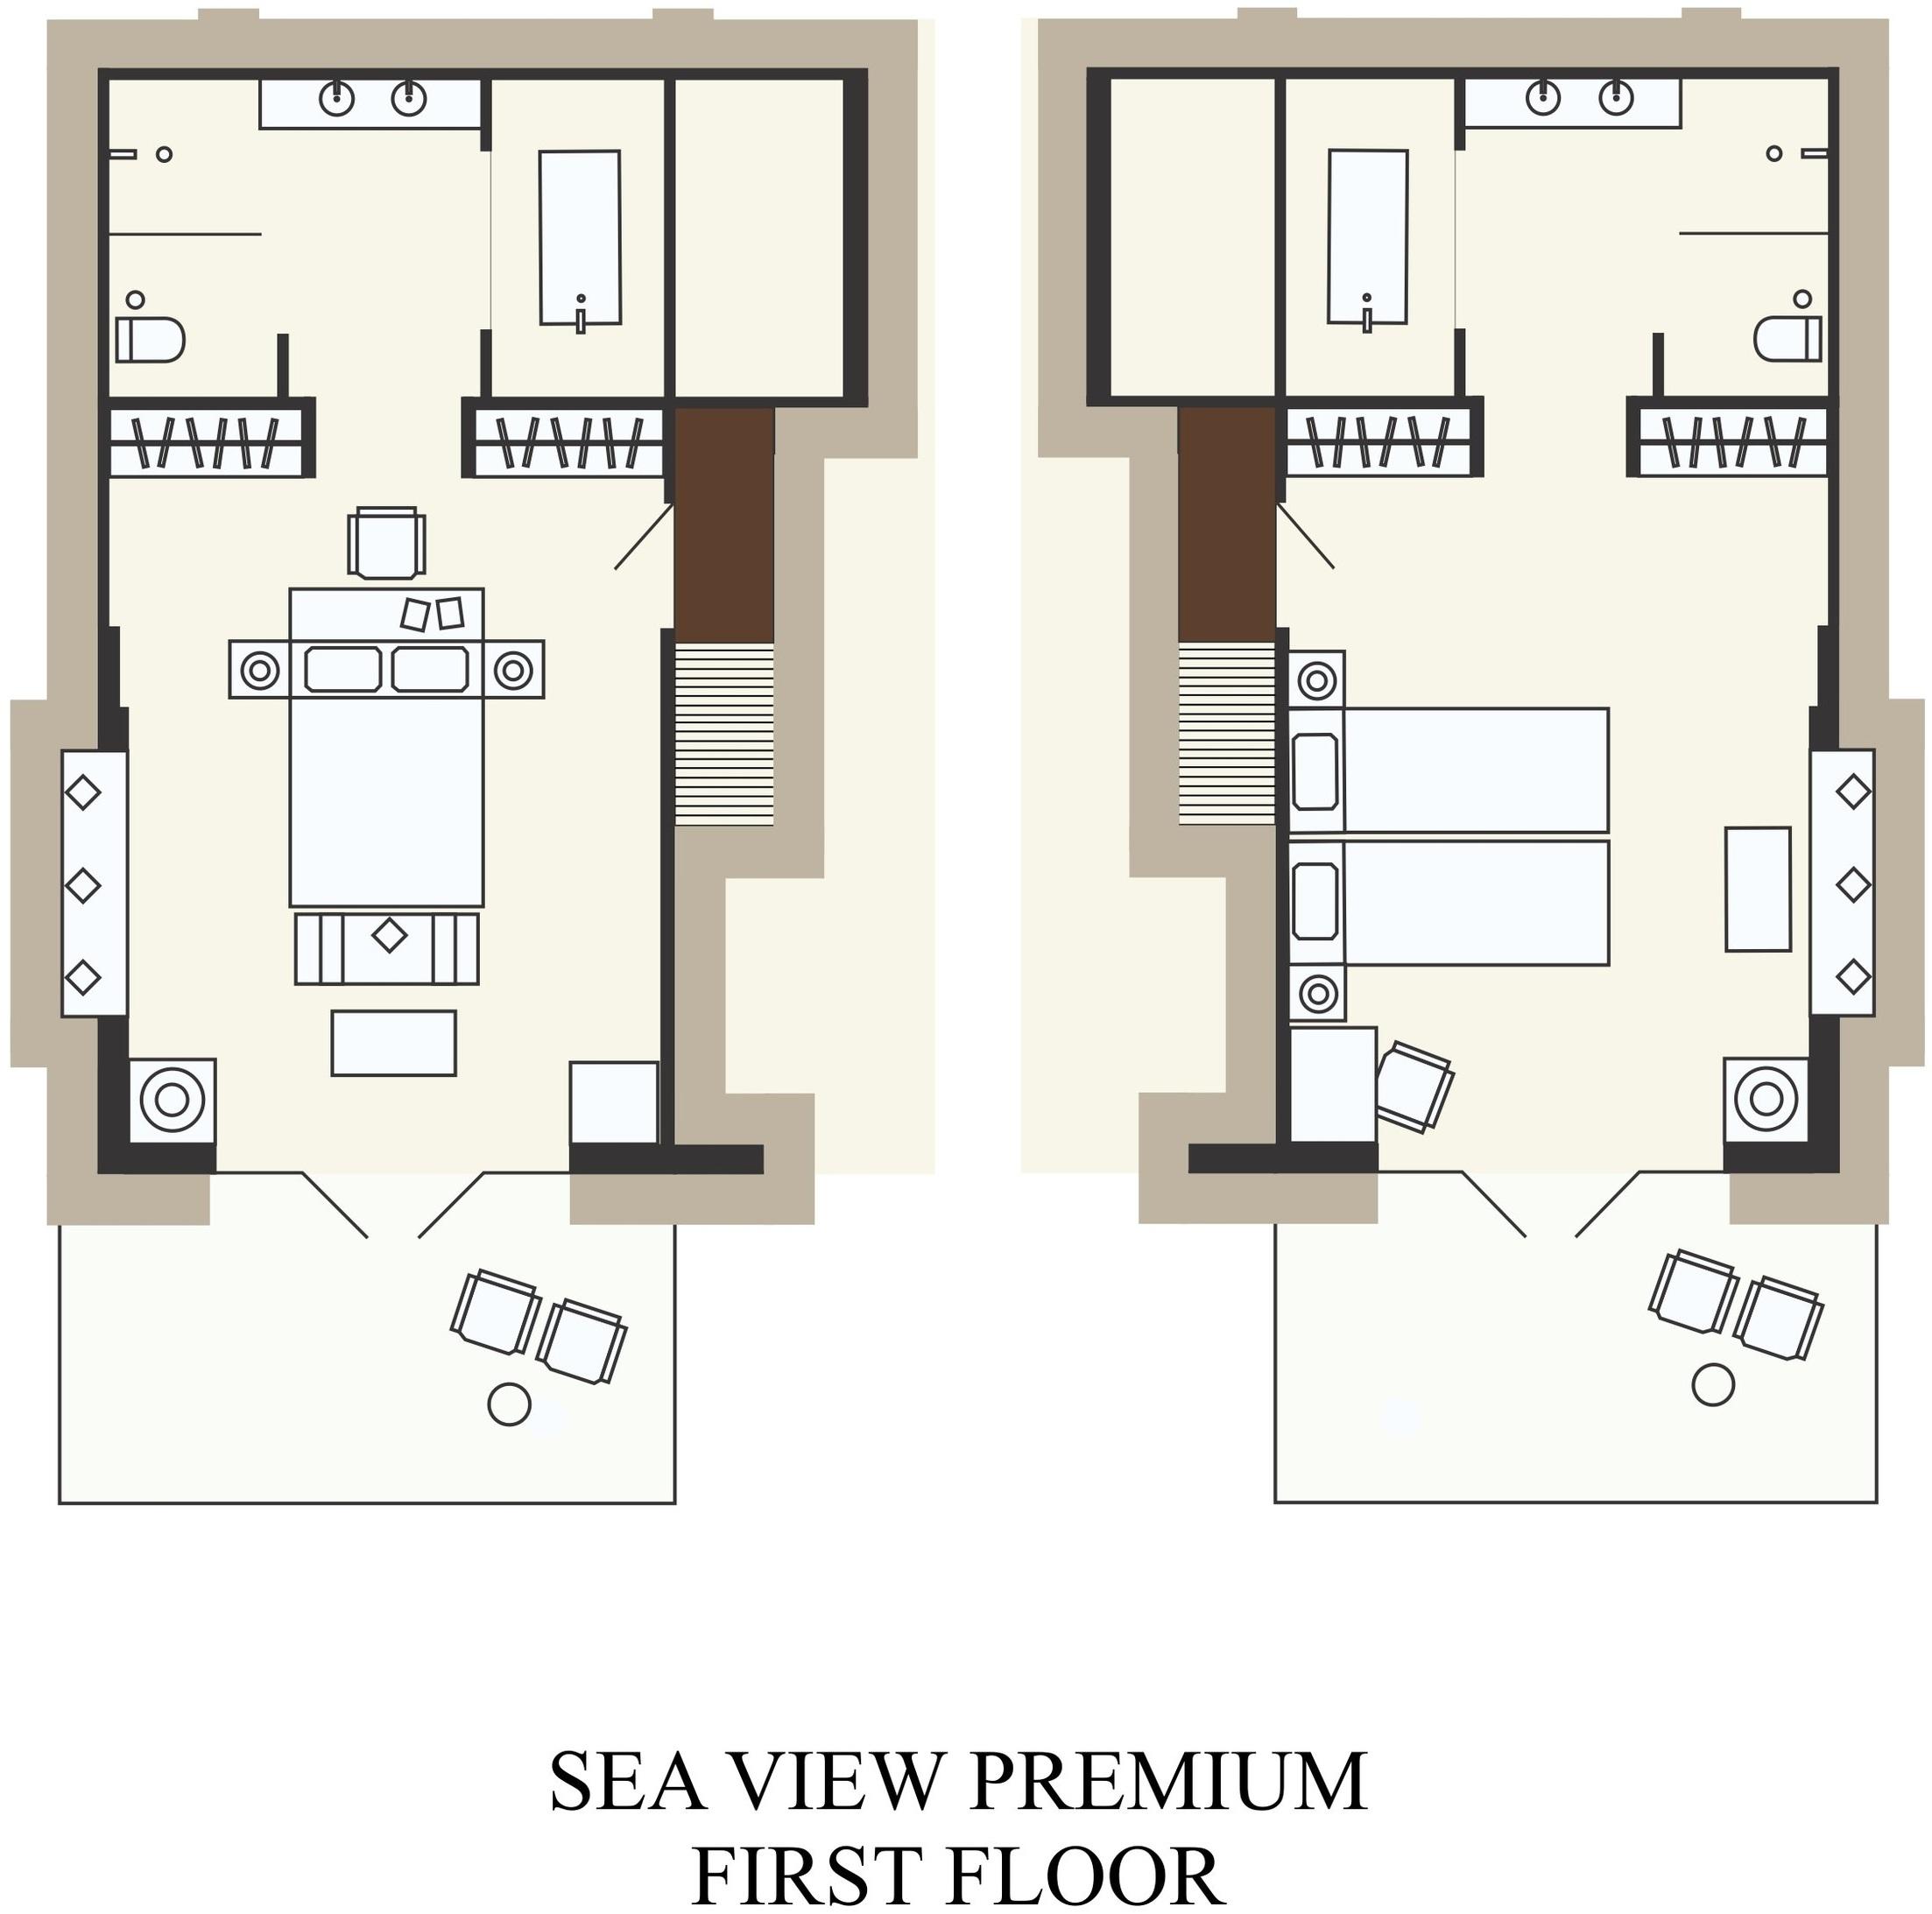 Sea+View+Premium_First+Floor.jpg